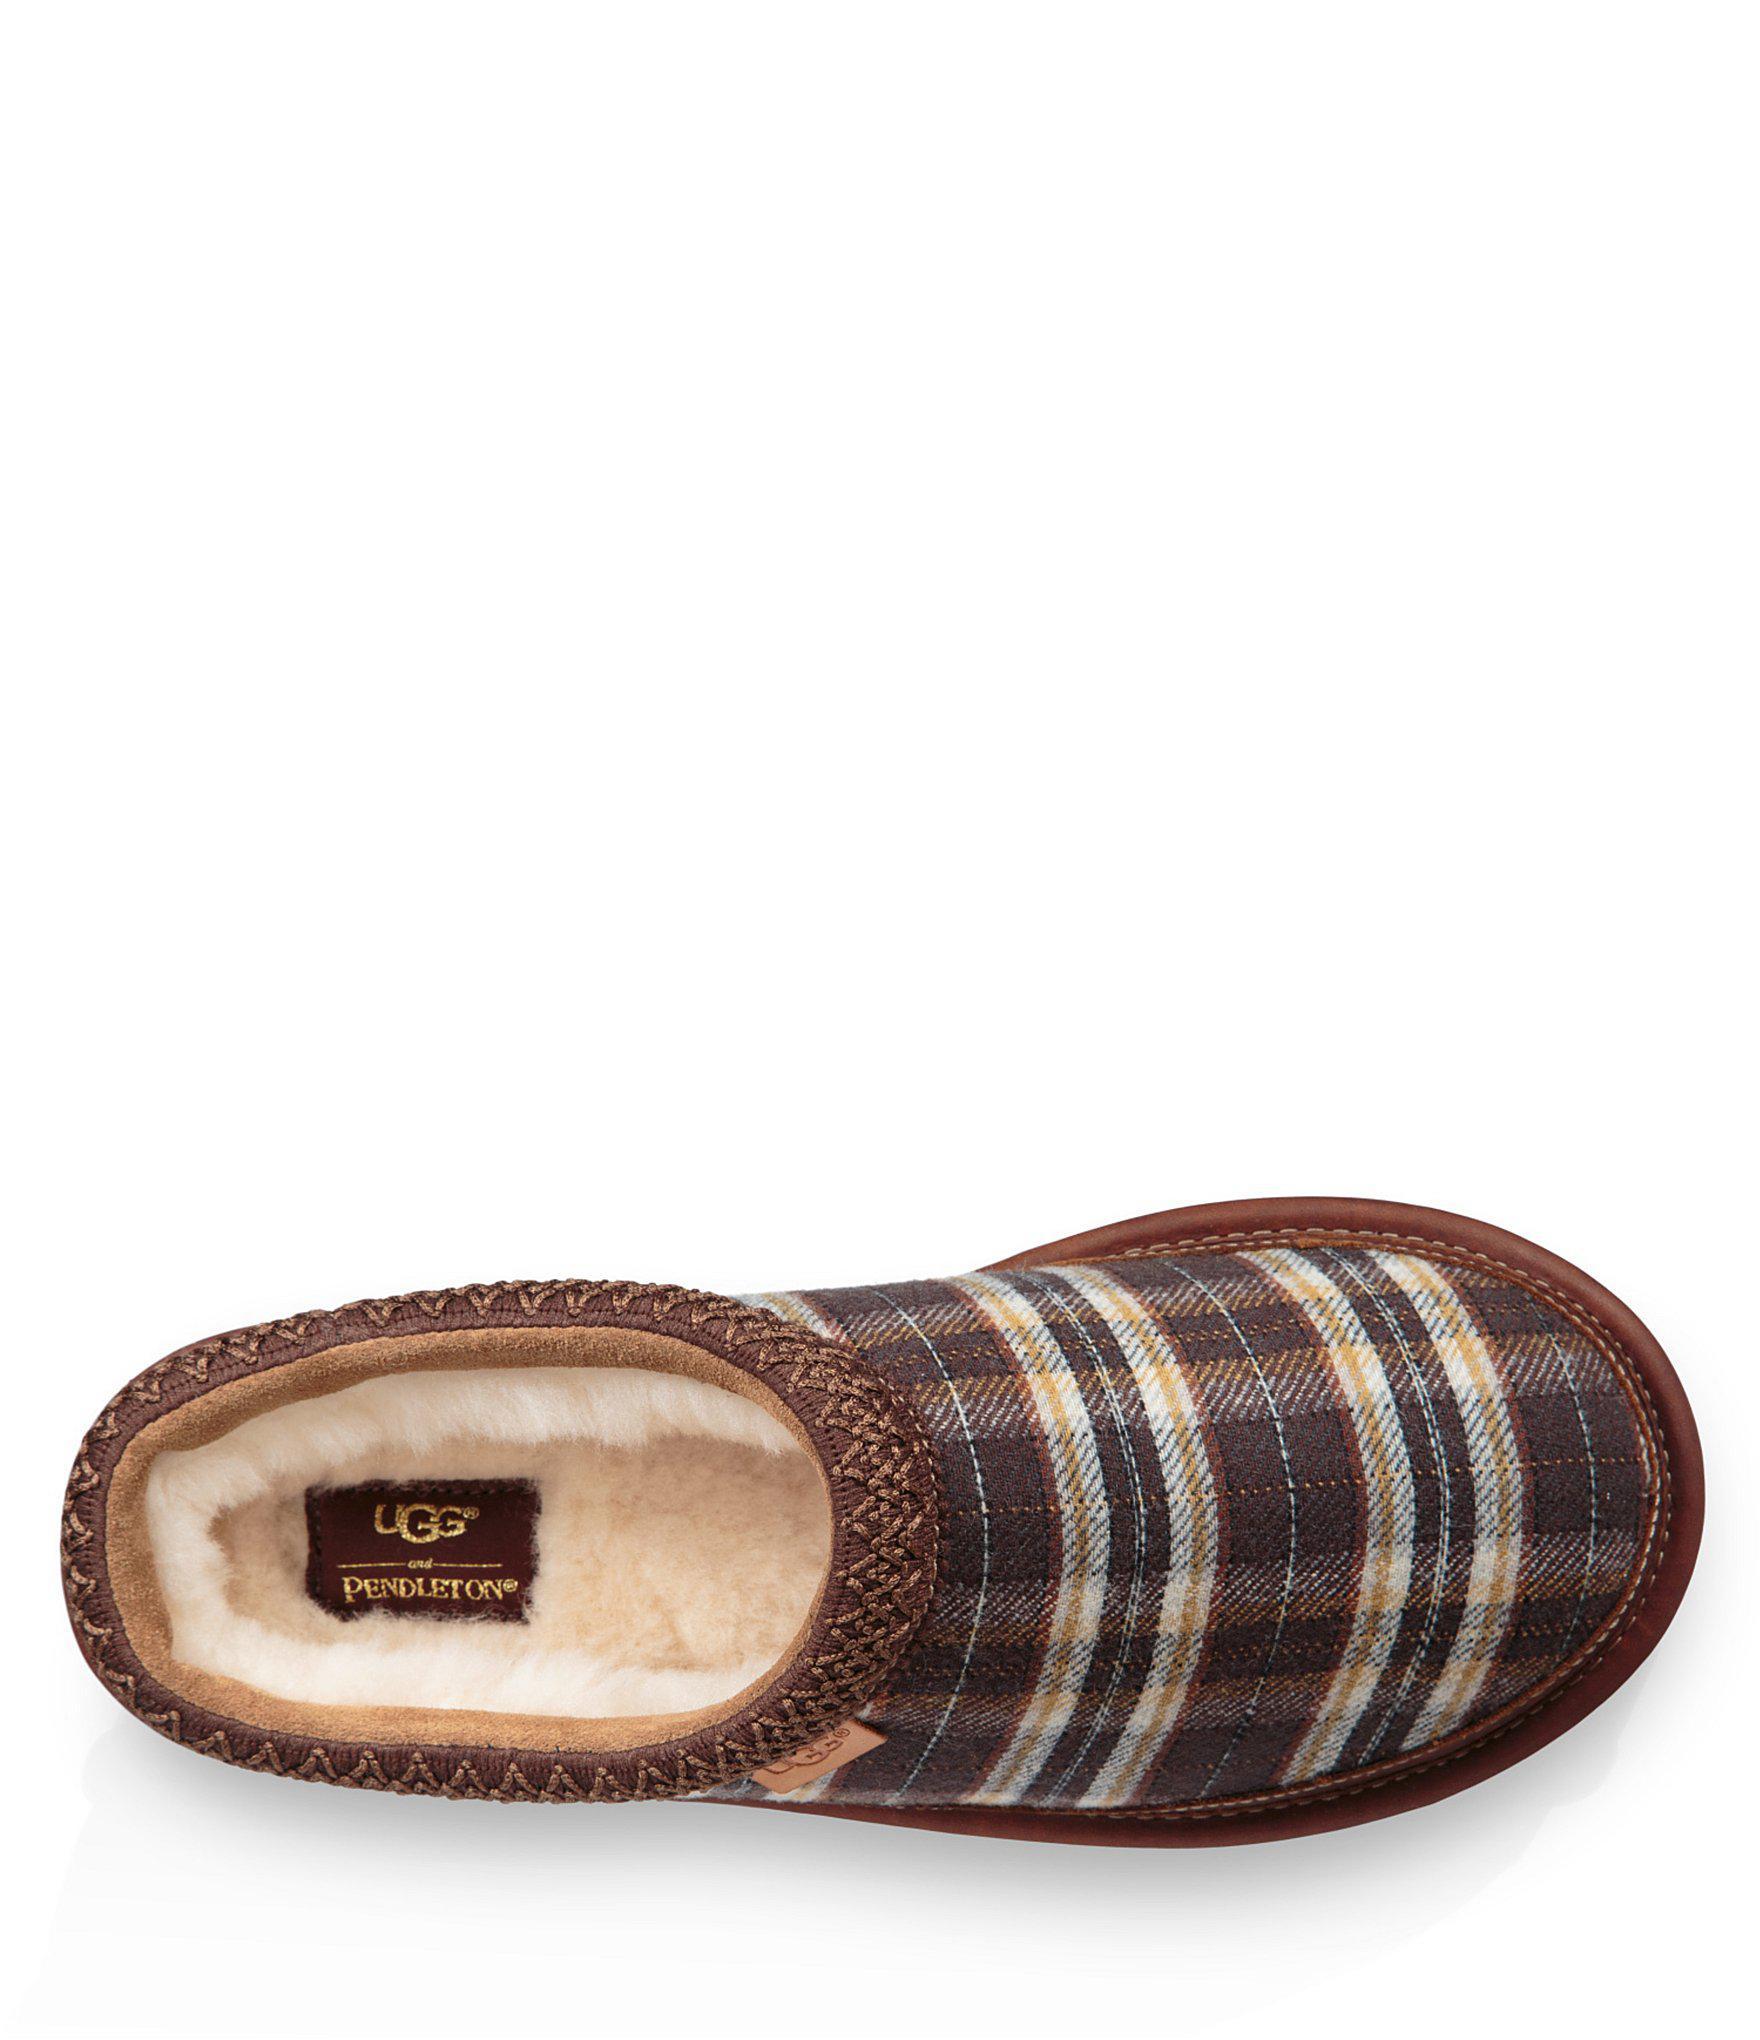 81f1bd8a370 Ugg Brown Men's Tasman Pendleton Plaid Slipper for men